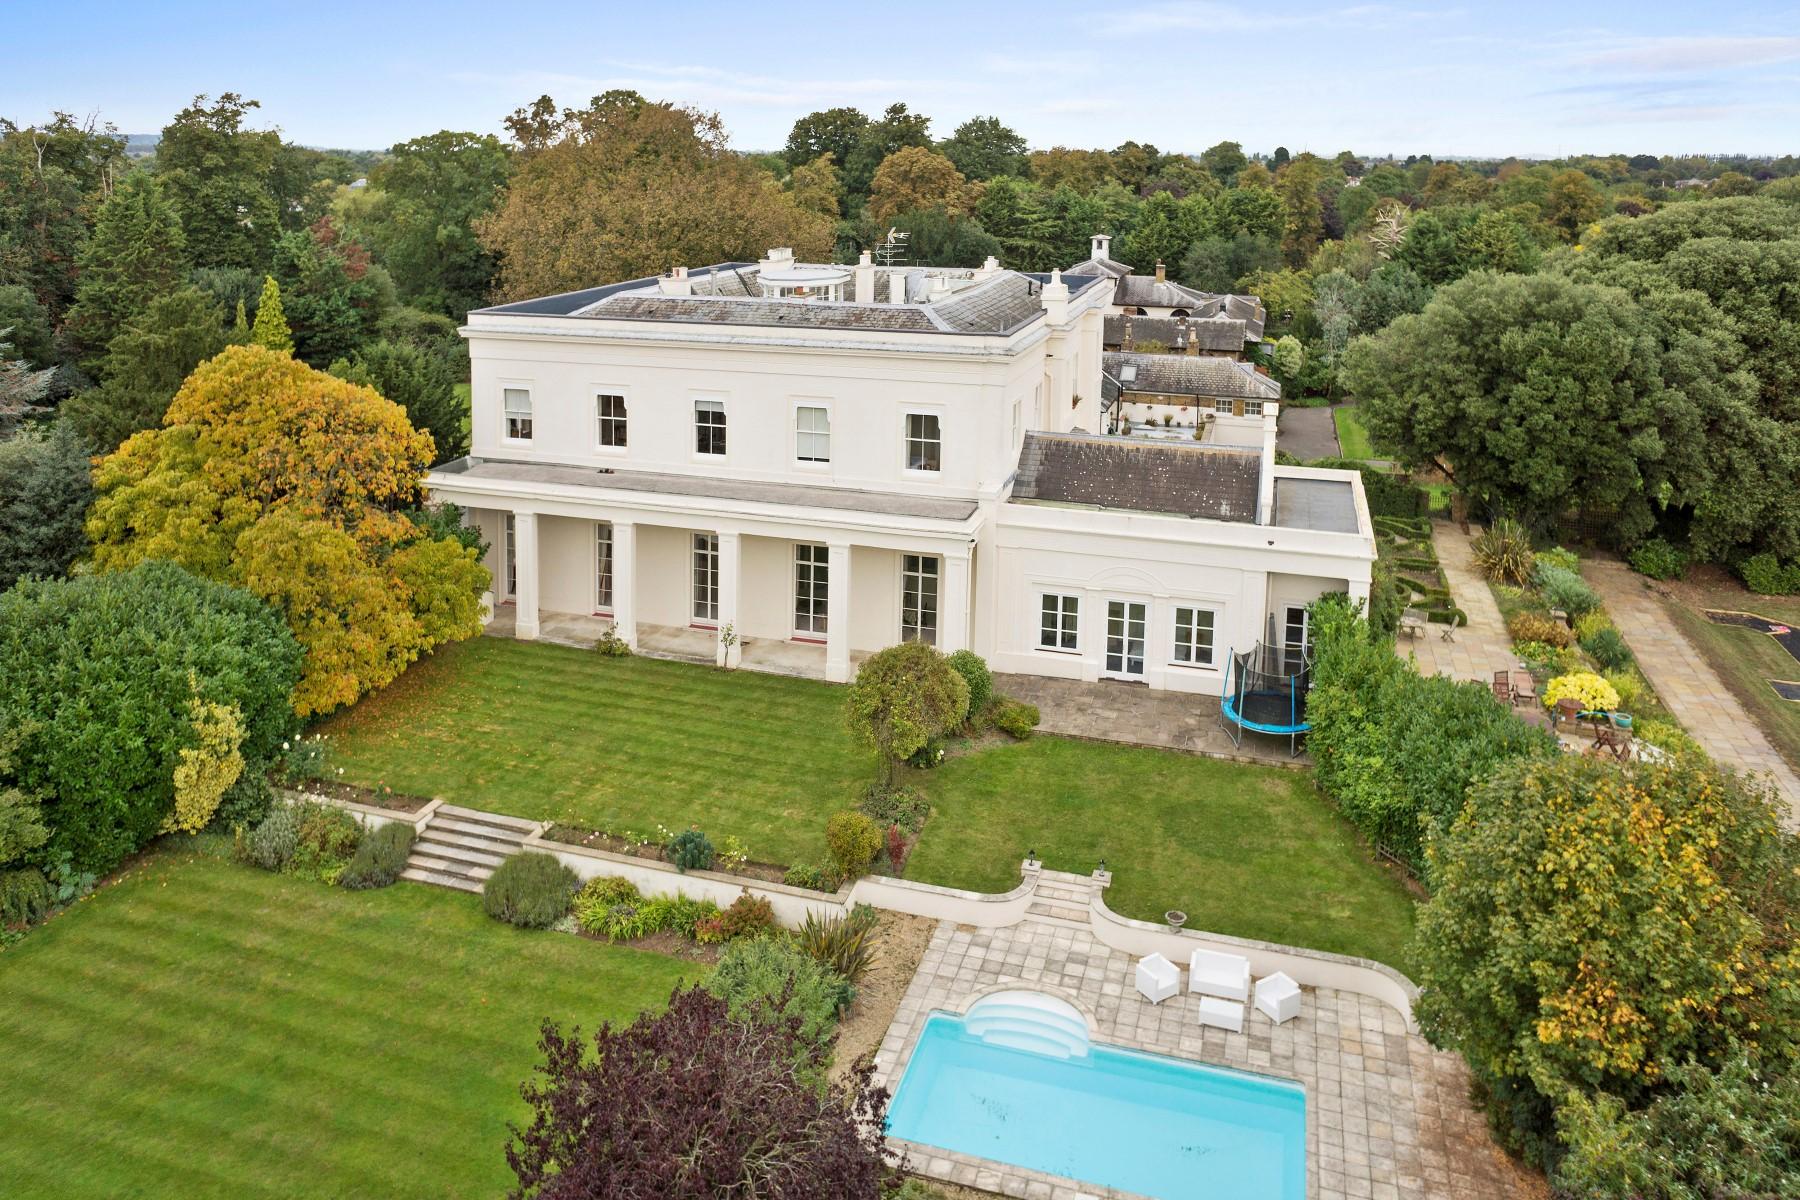 Apartamento para Venda às Laleham 1 Laleham Abbey Laleham Park Middlesex, Inglaterra, TW181SZ Reino Unido